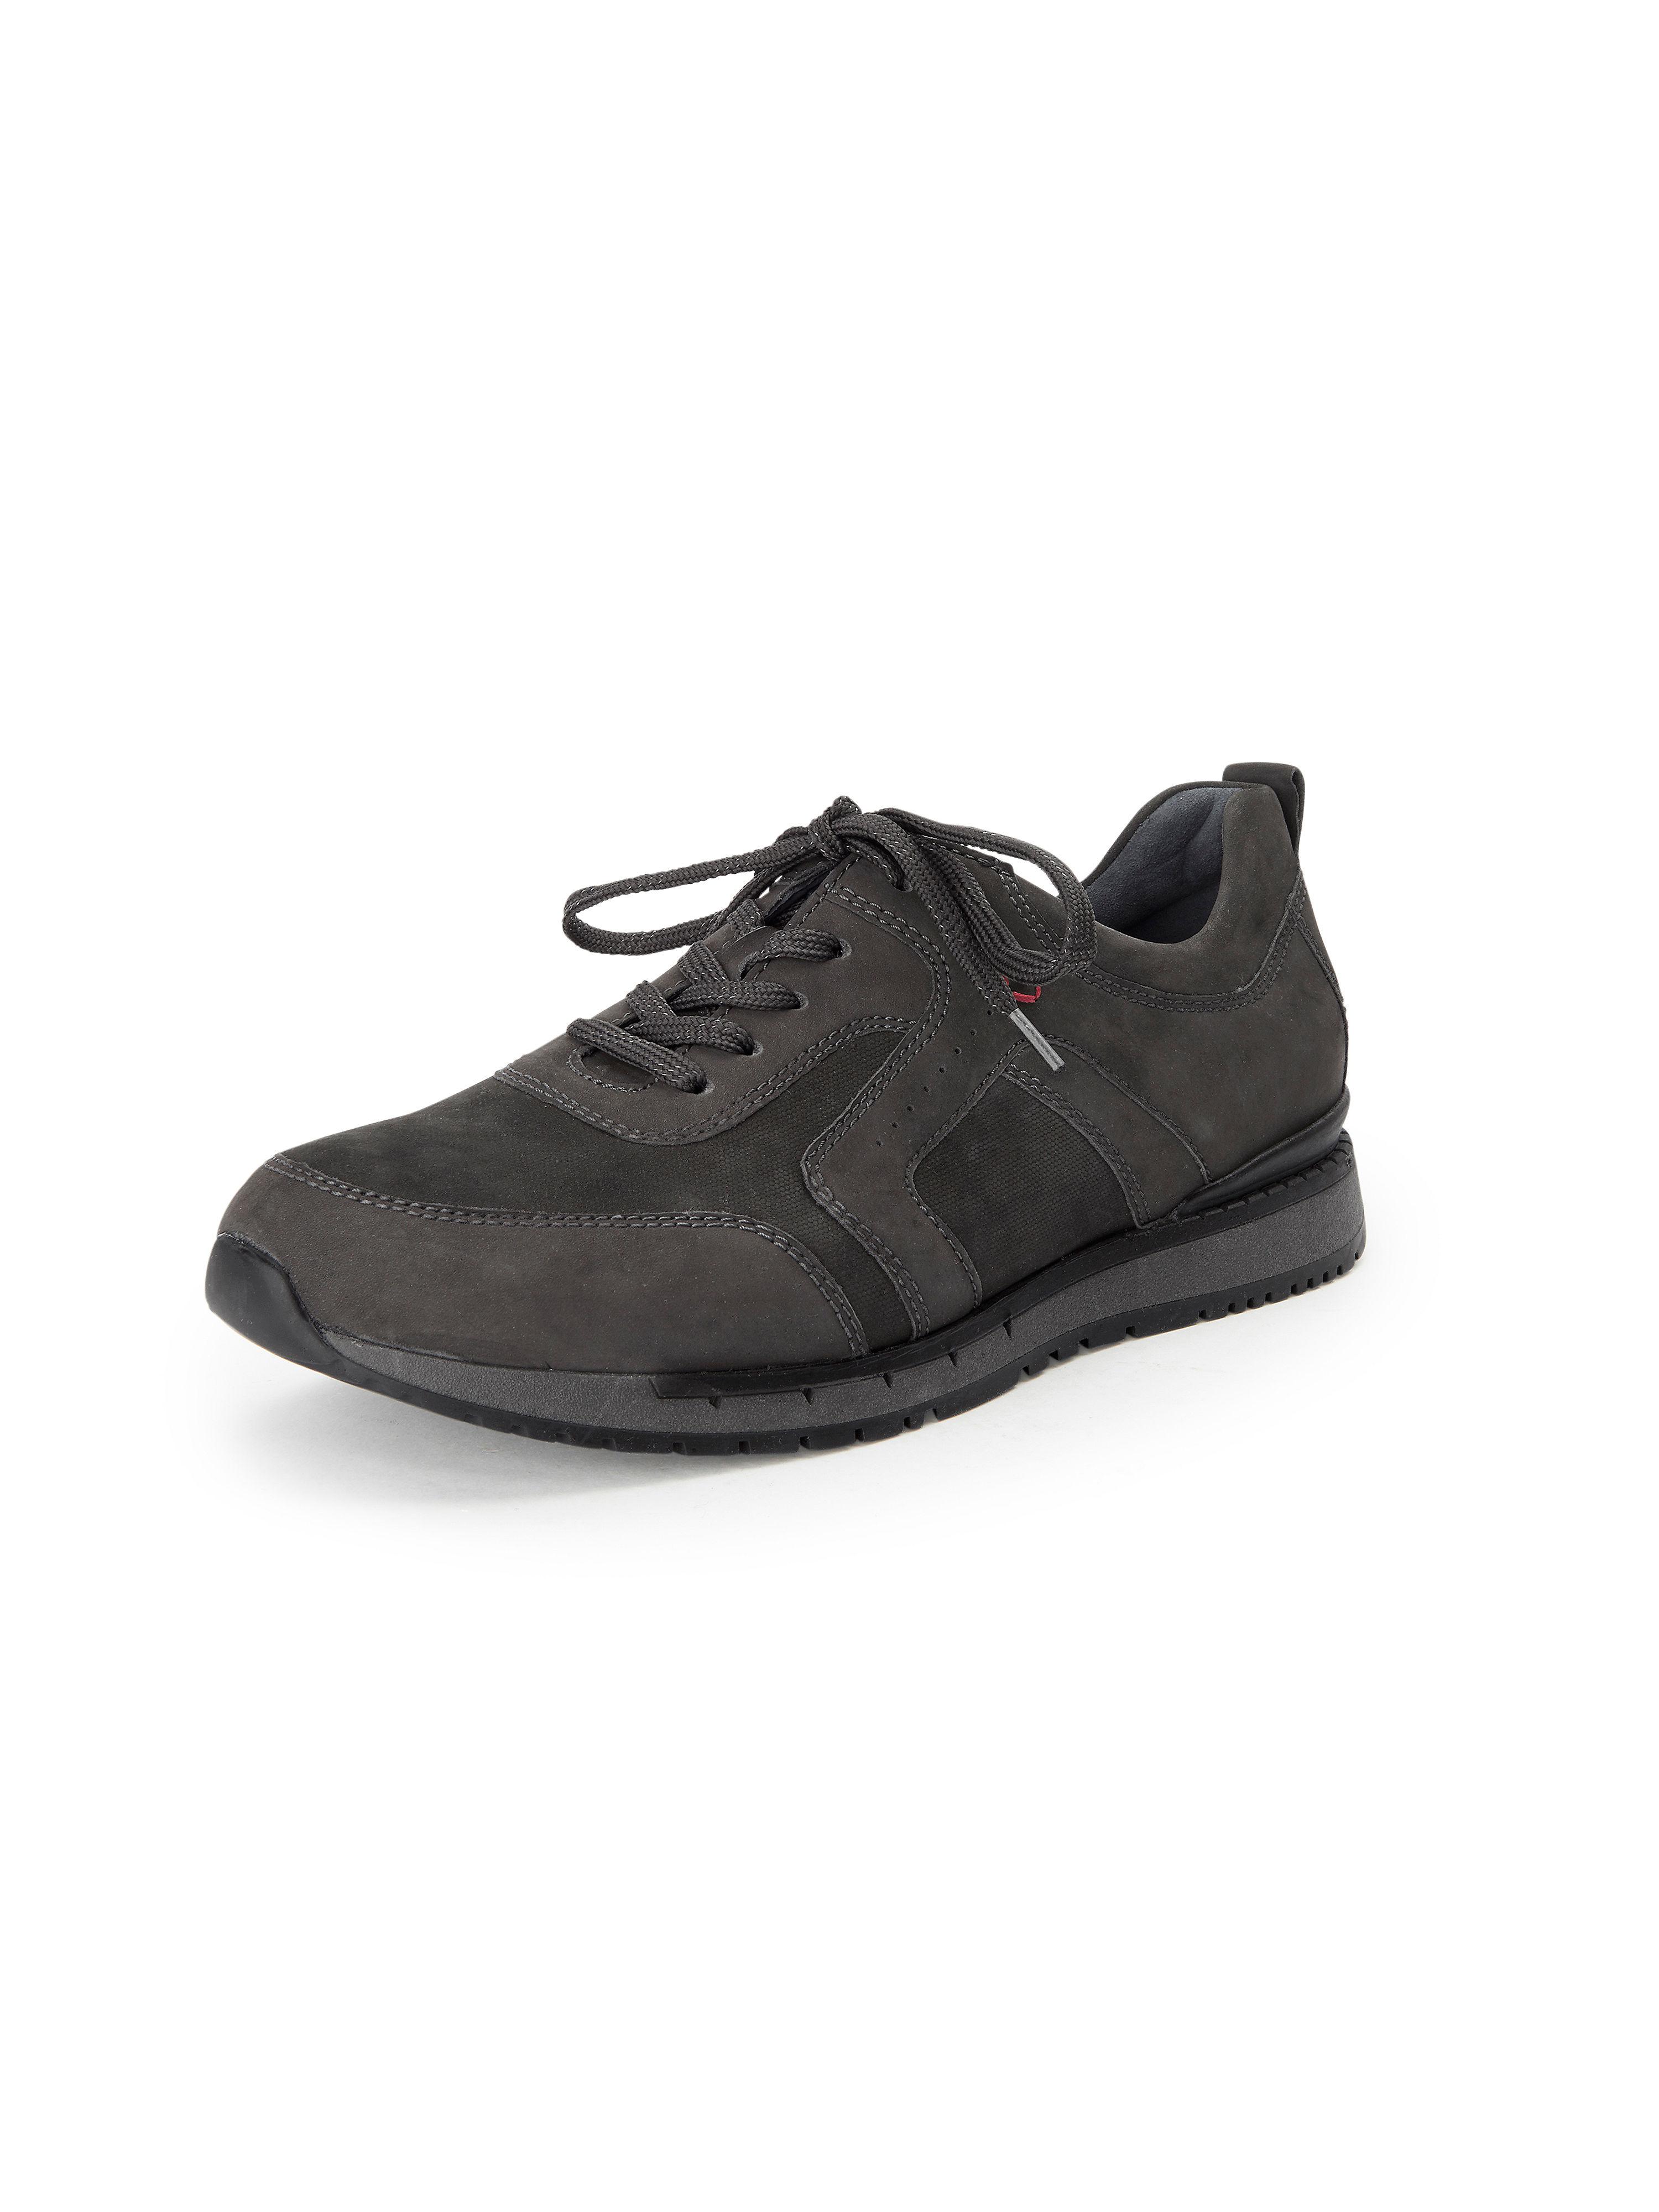 Image of   Sneakers Hudson 12 Fra Waldläufer grå